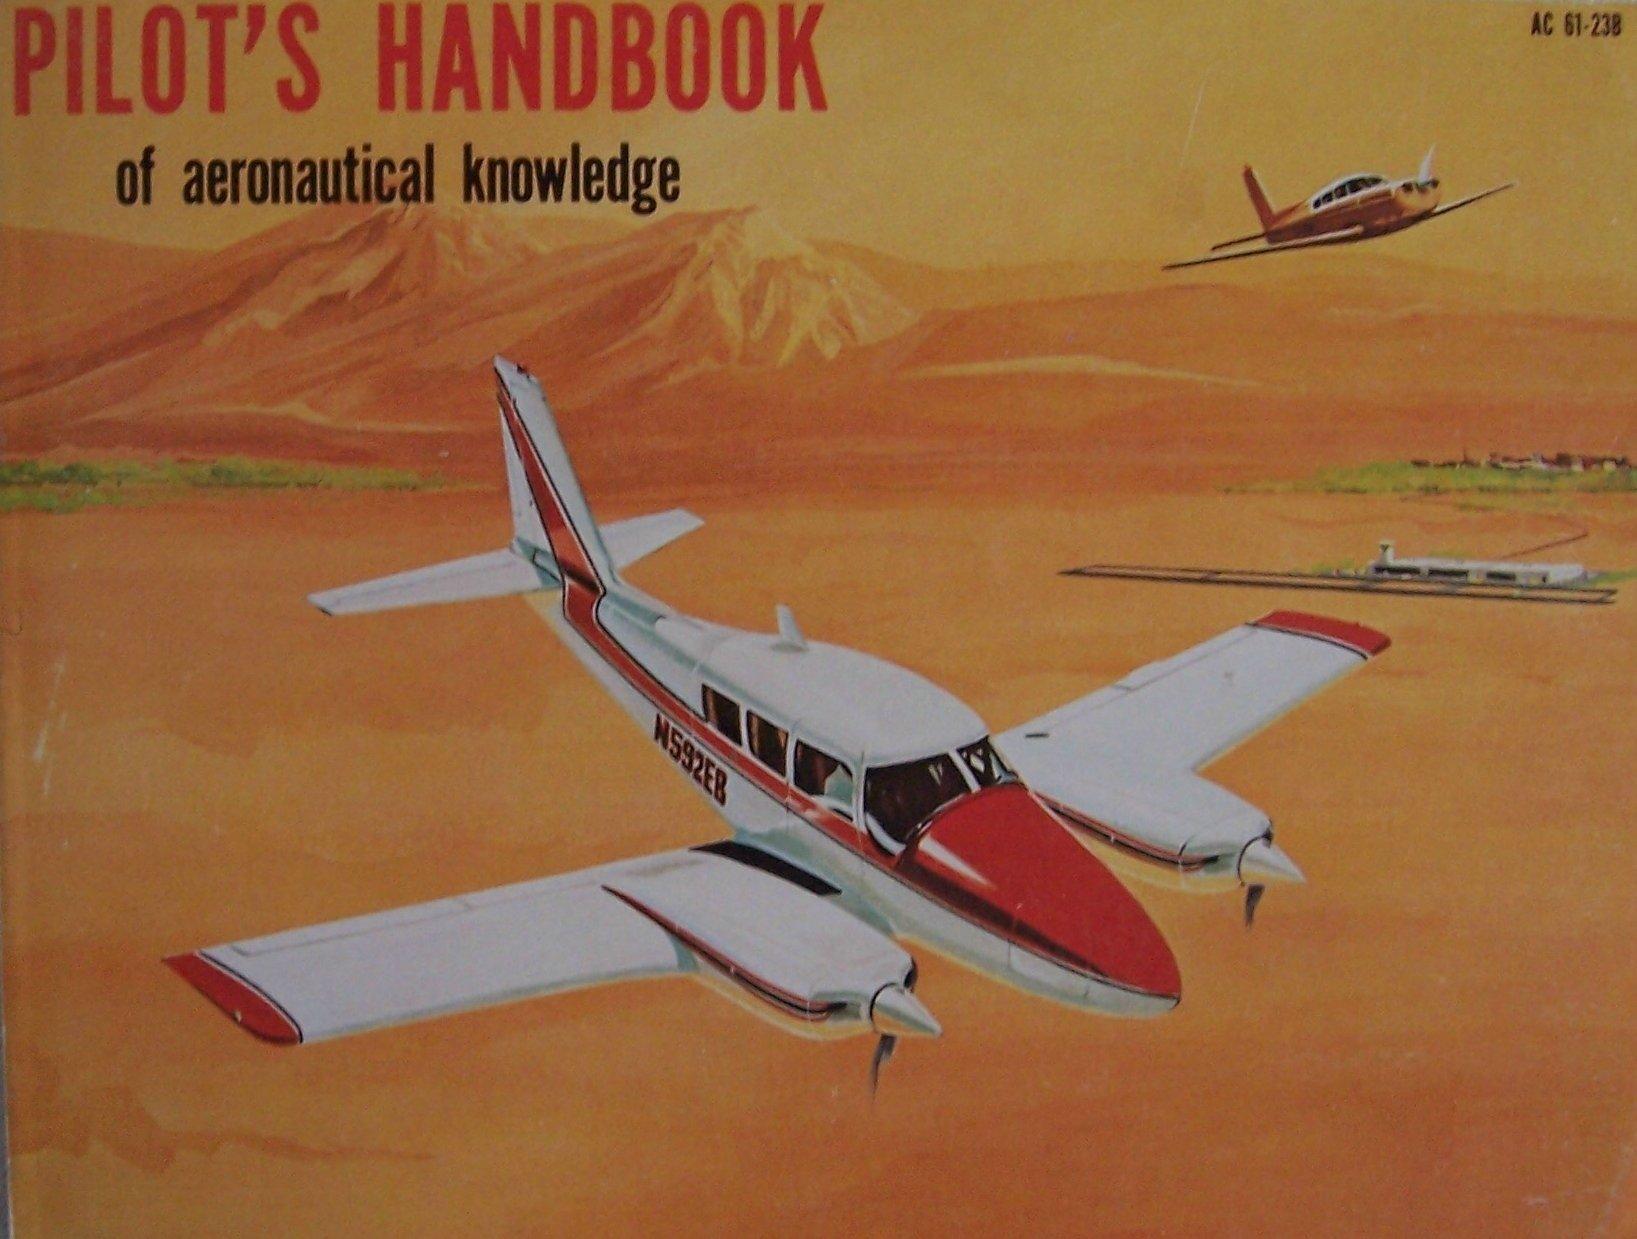 pilot-s-handbook-of-aeronautical-knowledge-ac-61-23b-revised-1980